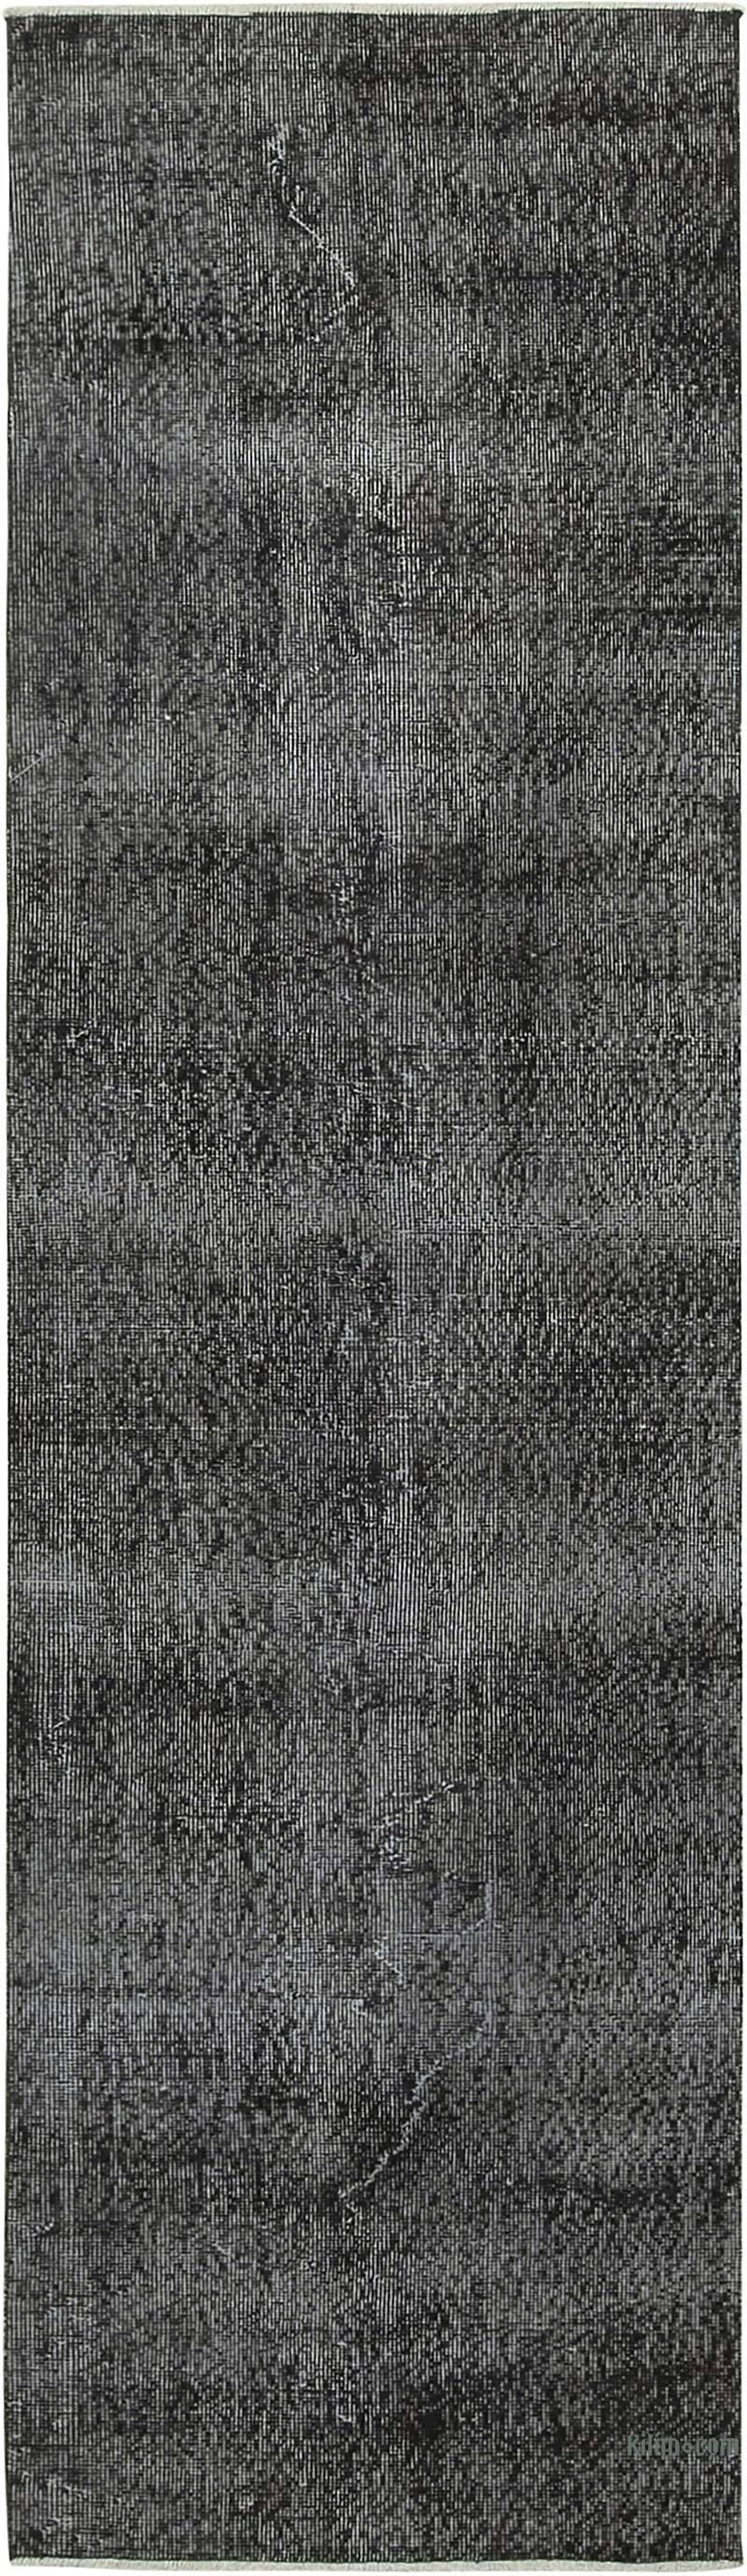 "Black Over-dyed Turkish Vintage Runner Rug - 2' 7"" x 9' 5"" (31 in. x 113 in.) - K0054500"